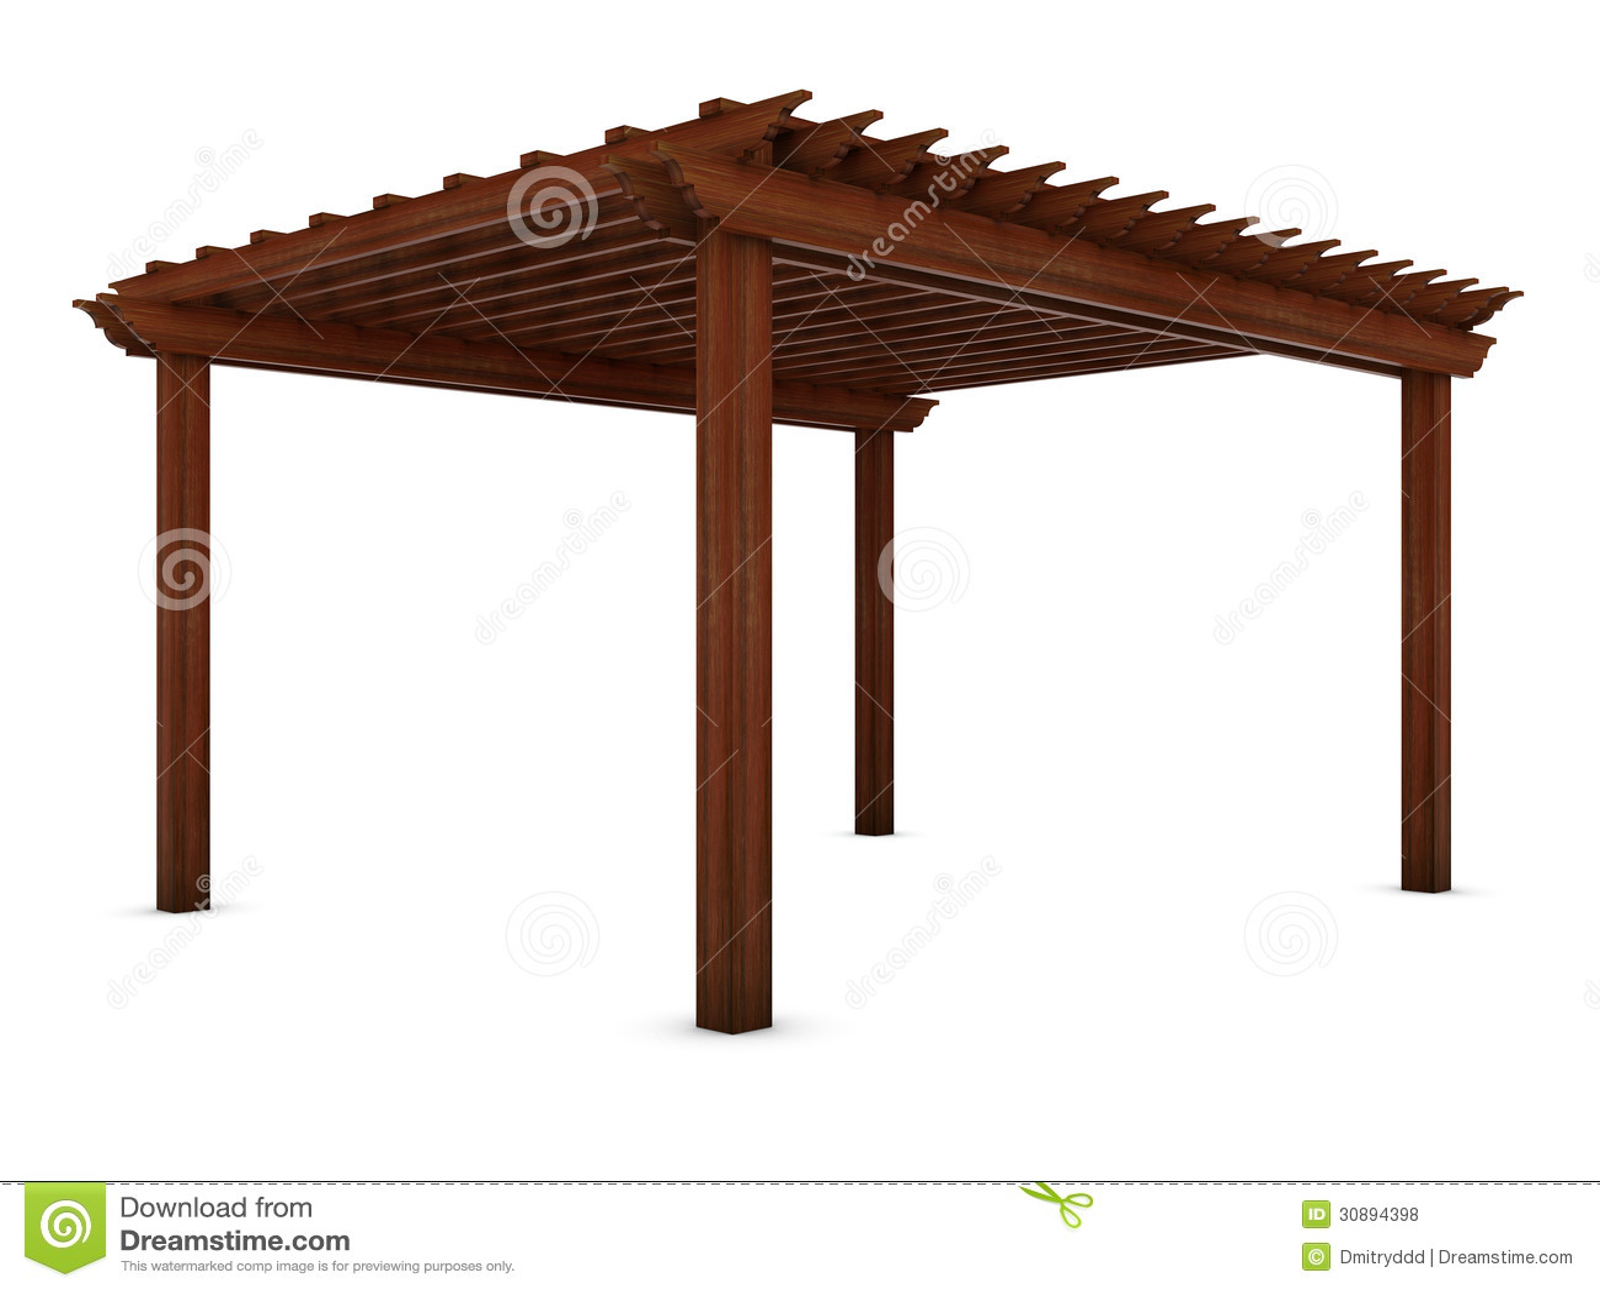 Construction Pergola Bois Plan pergola: wooden pergola